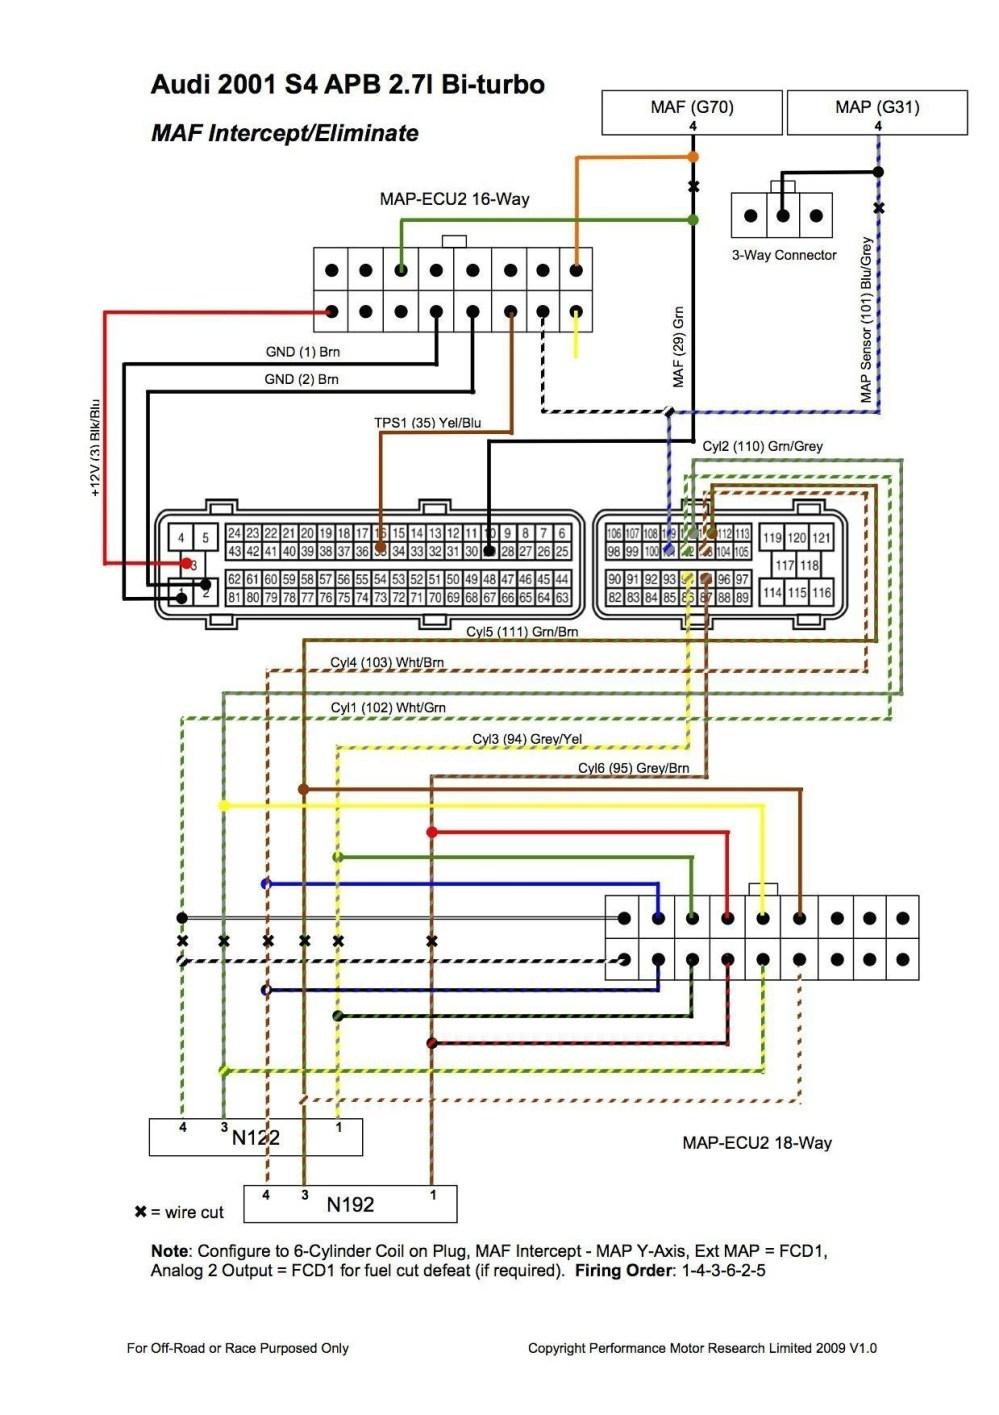 medium resolution of 1996 dodge grand caravan wiring diagram trusted wiring diagrams u2022 94 dodge caravan wiring diagram